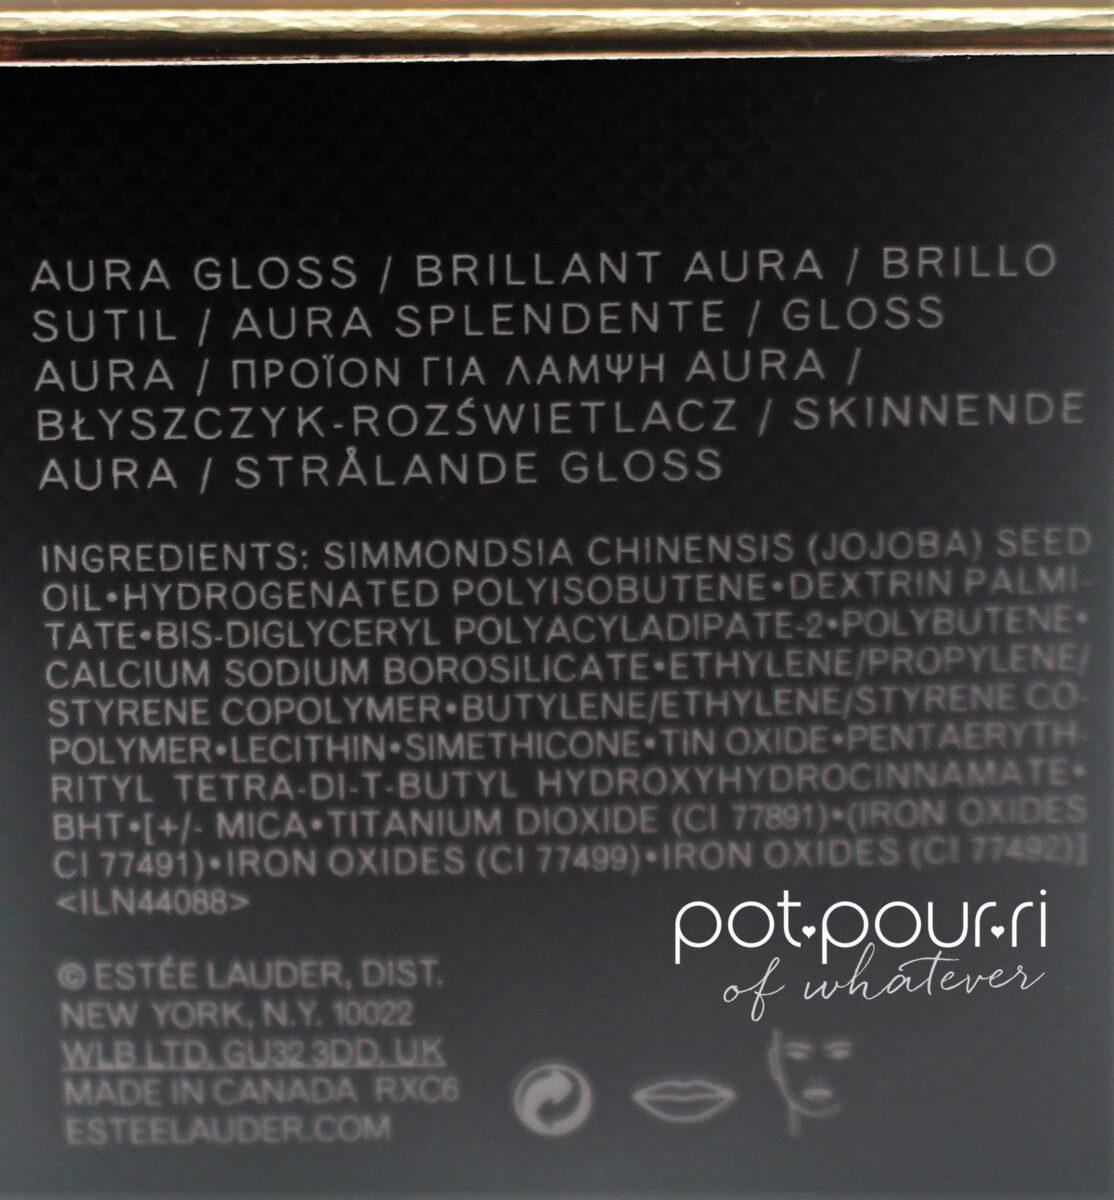 Aura Gloss ingredients